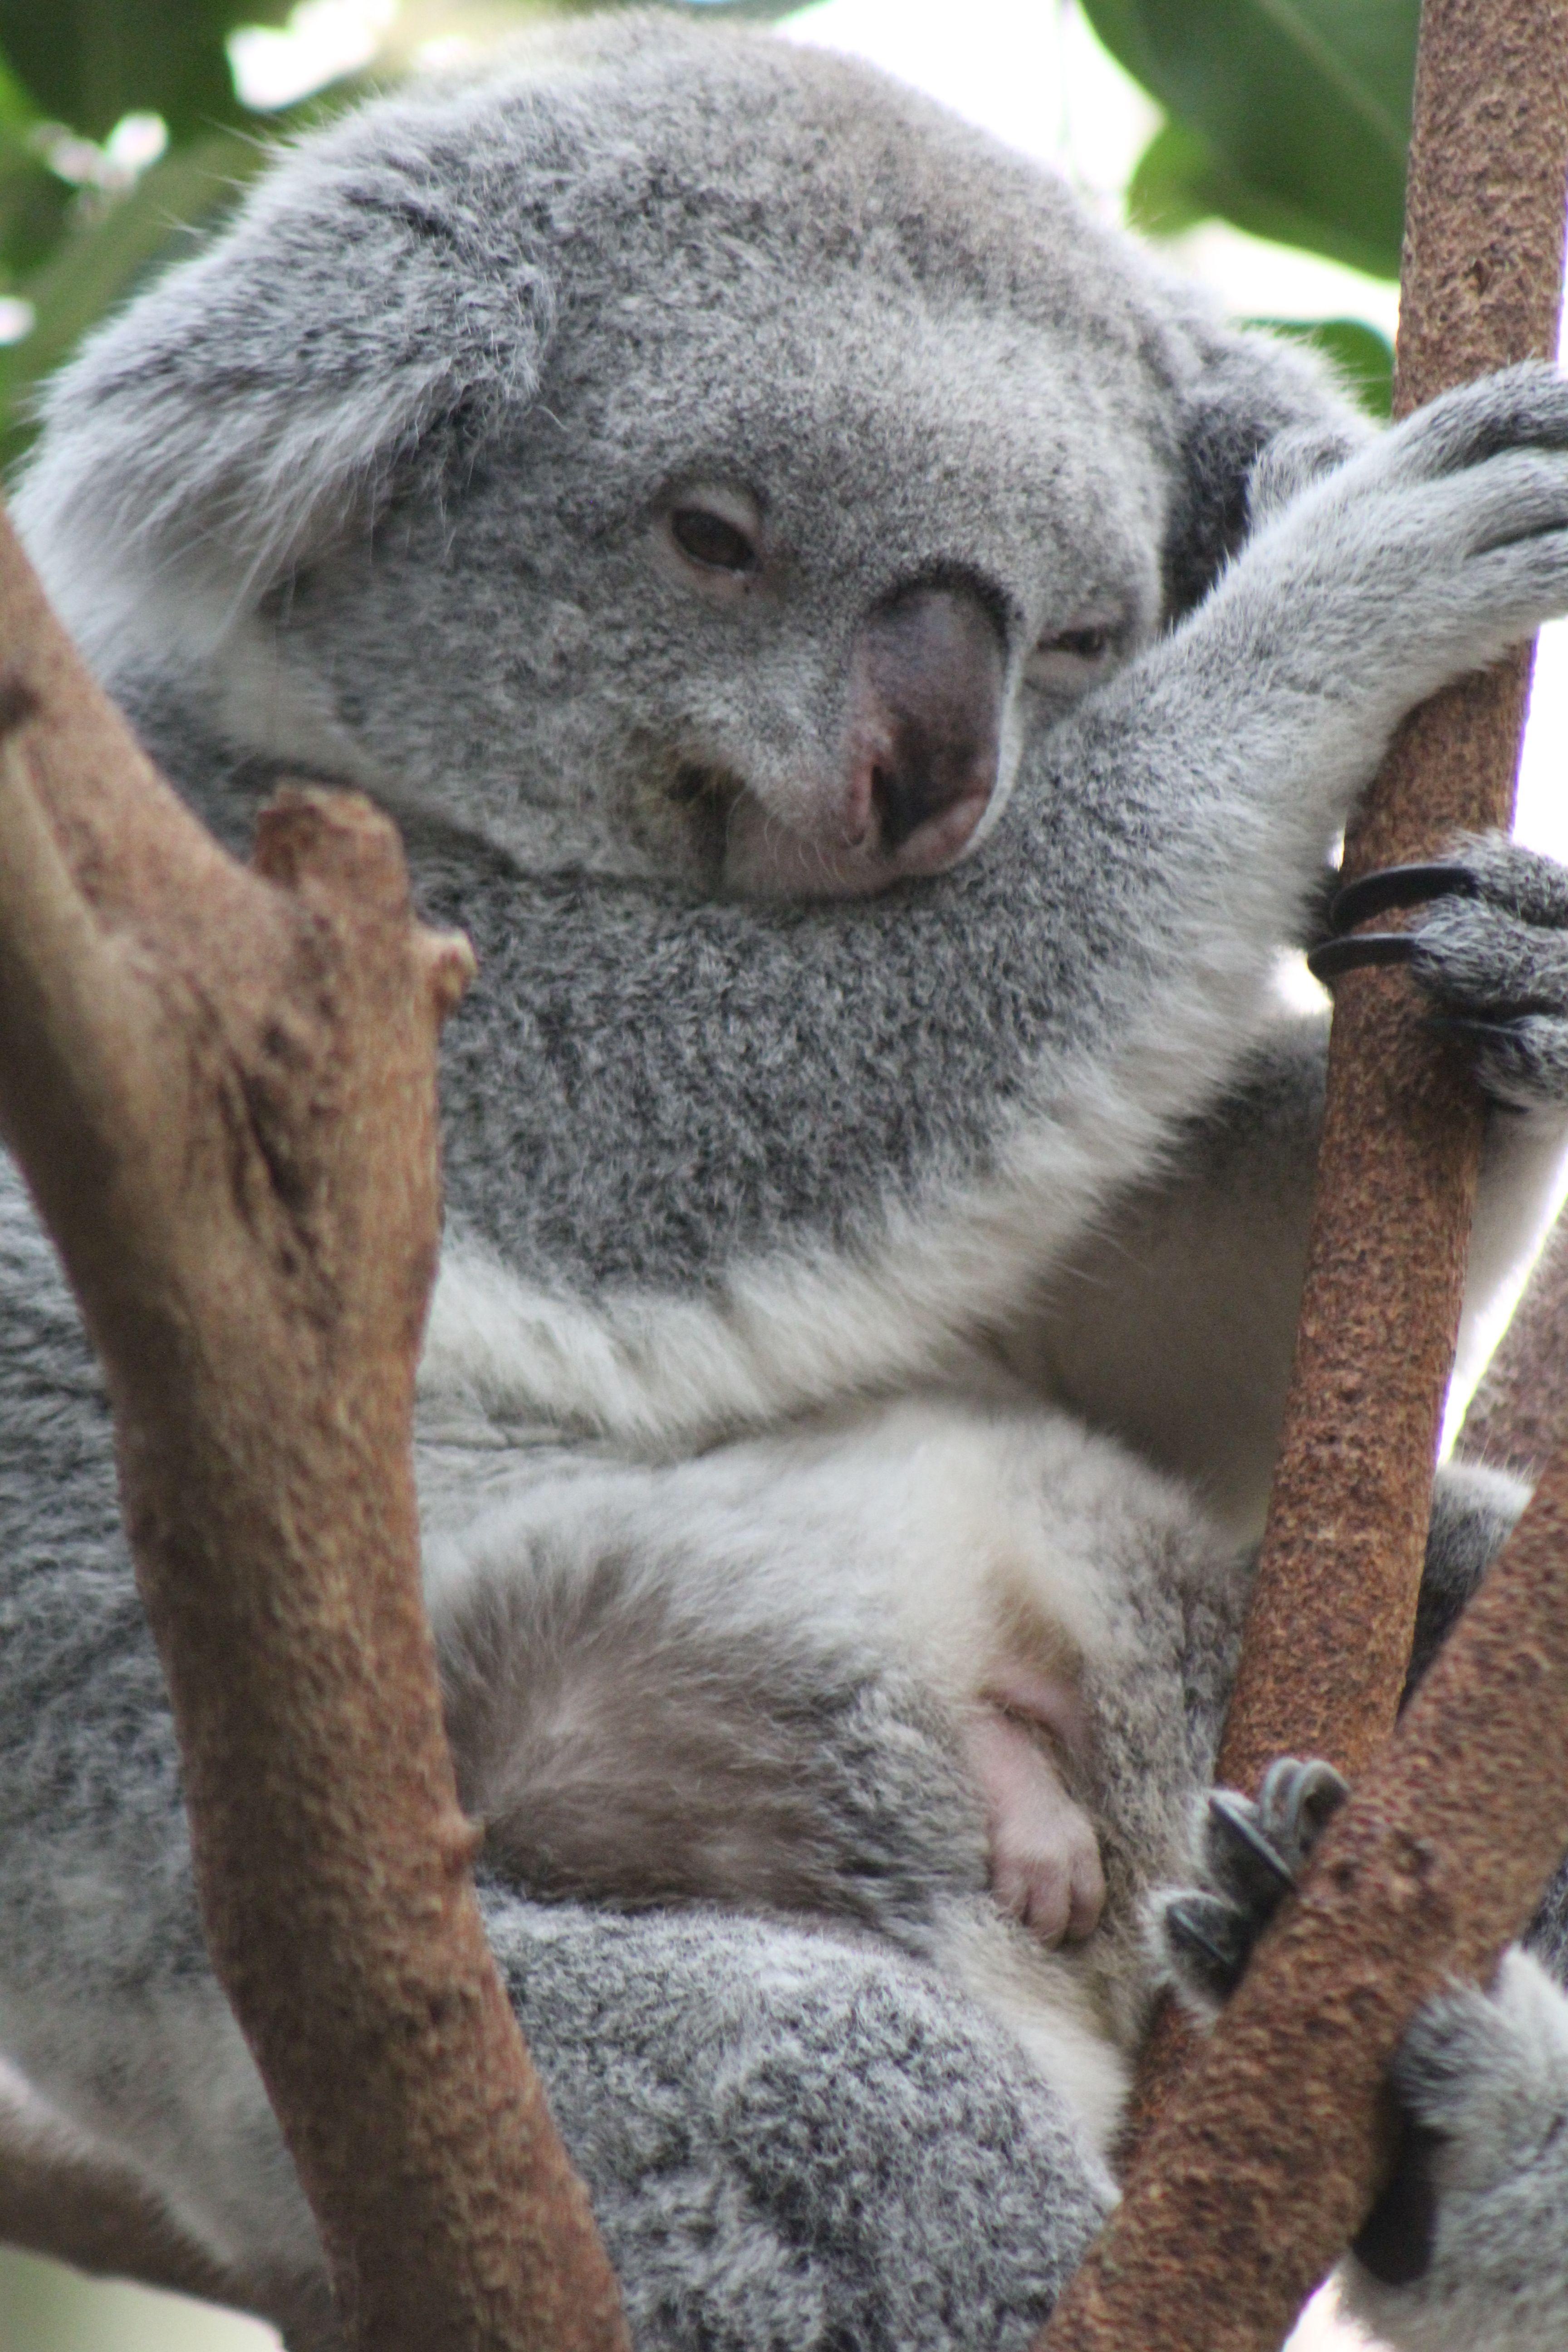 Duisburg (With images) Koala bear, Koala, Cute animals